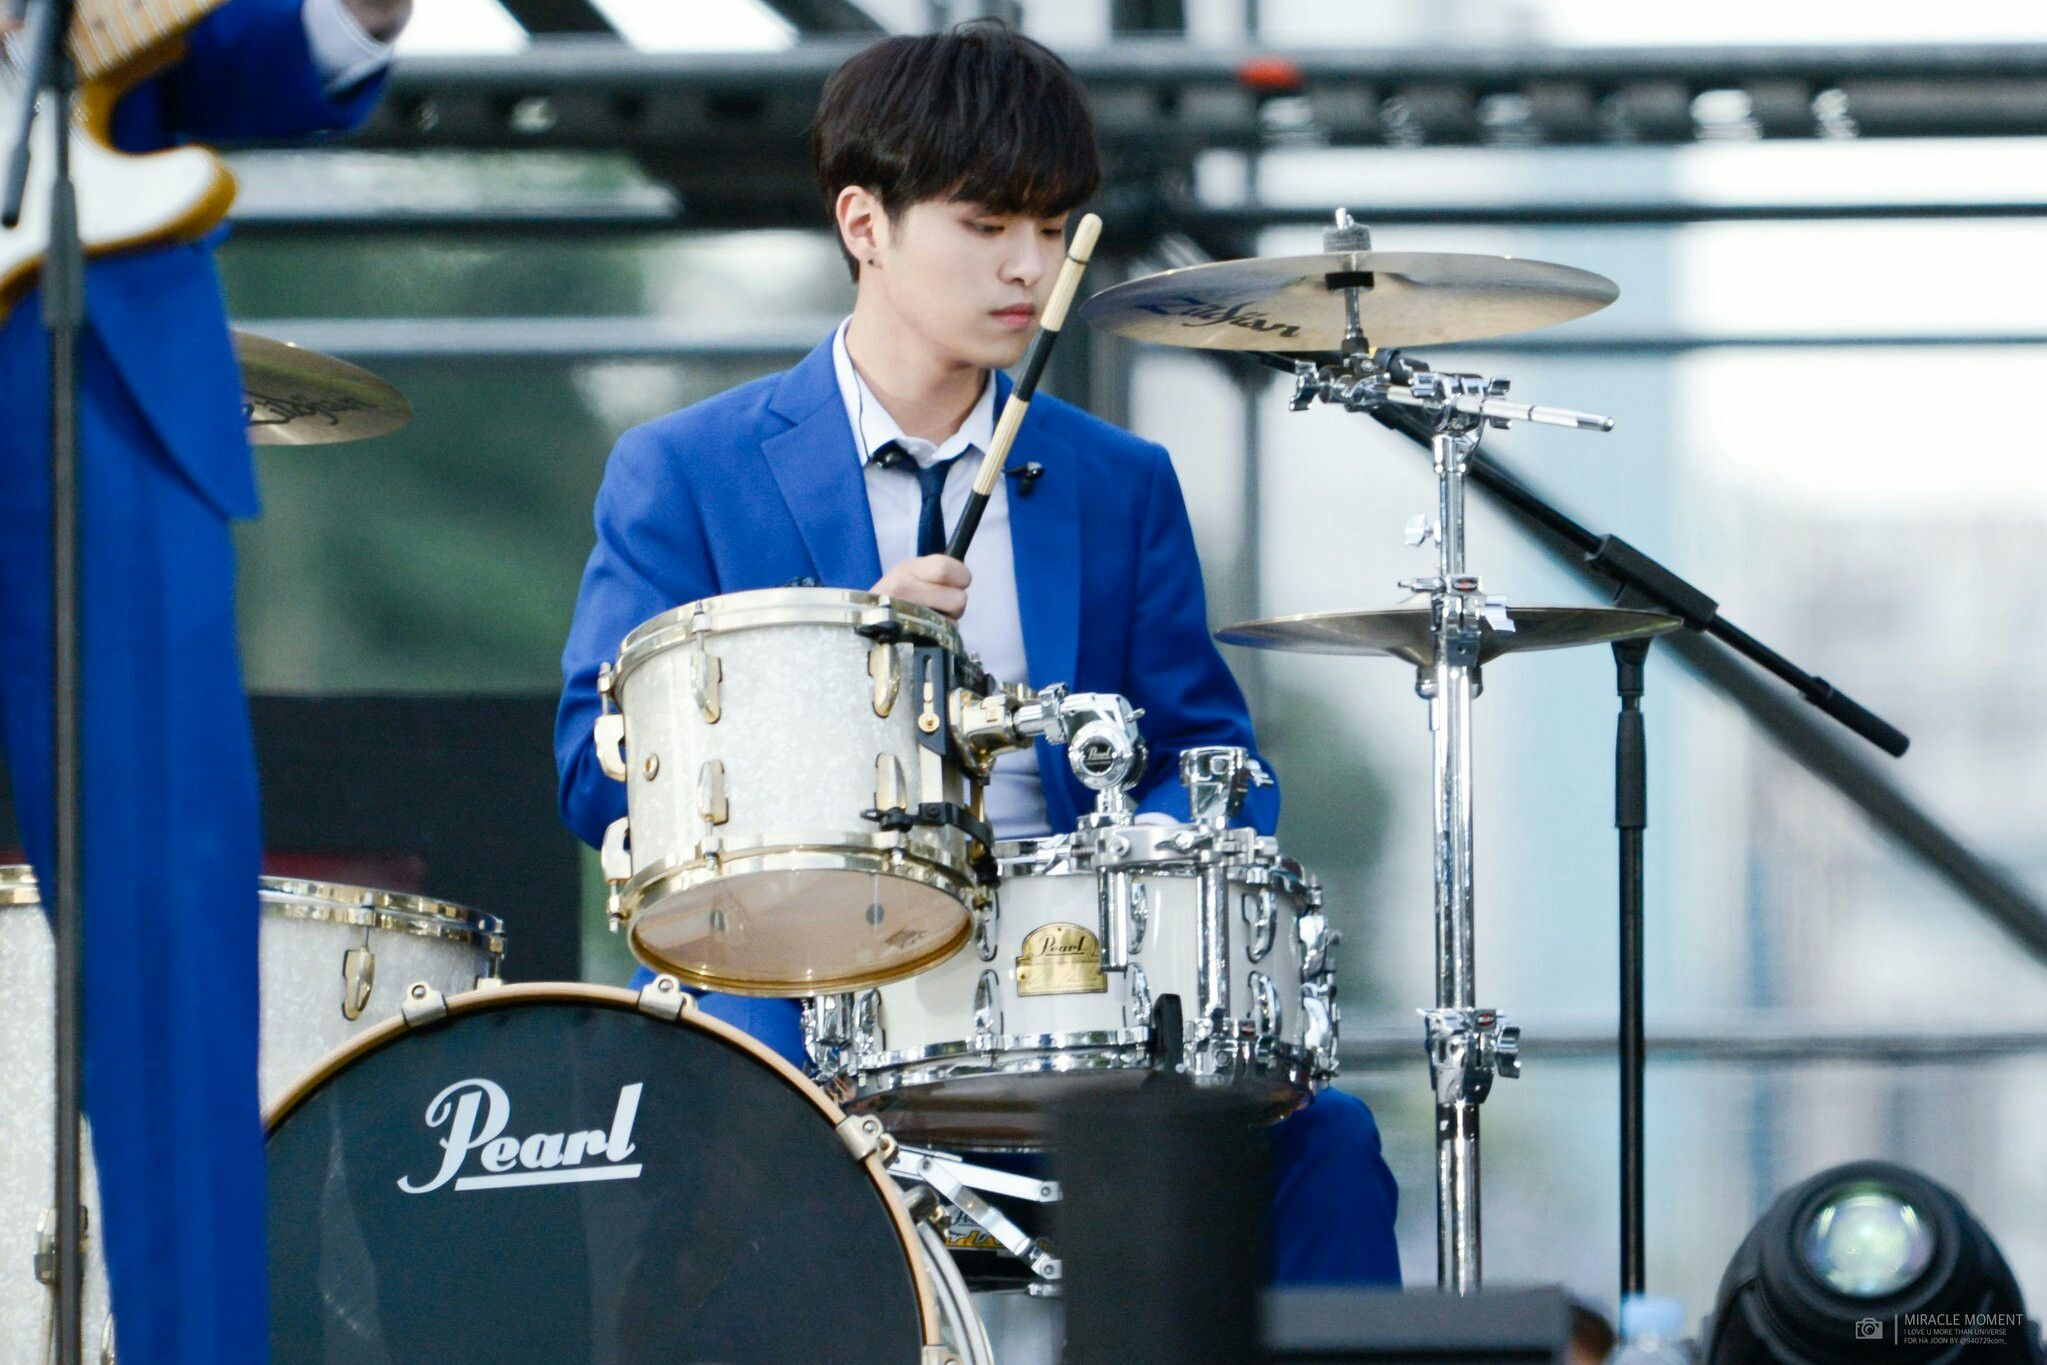 Hajoon The Rose Kpop Therose Theroseband Kpopband Korean Bands Kpop Rose